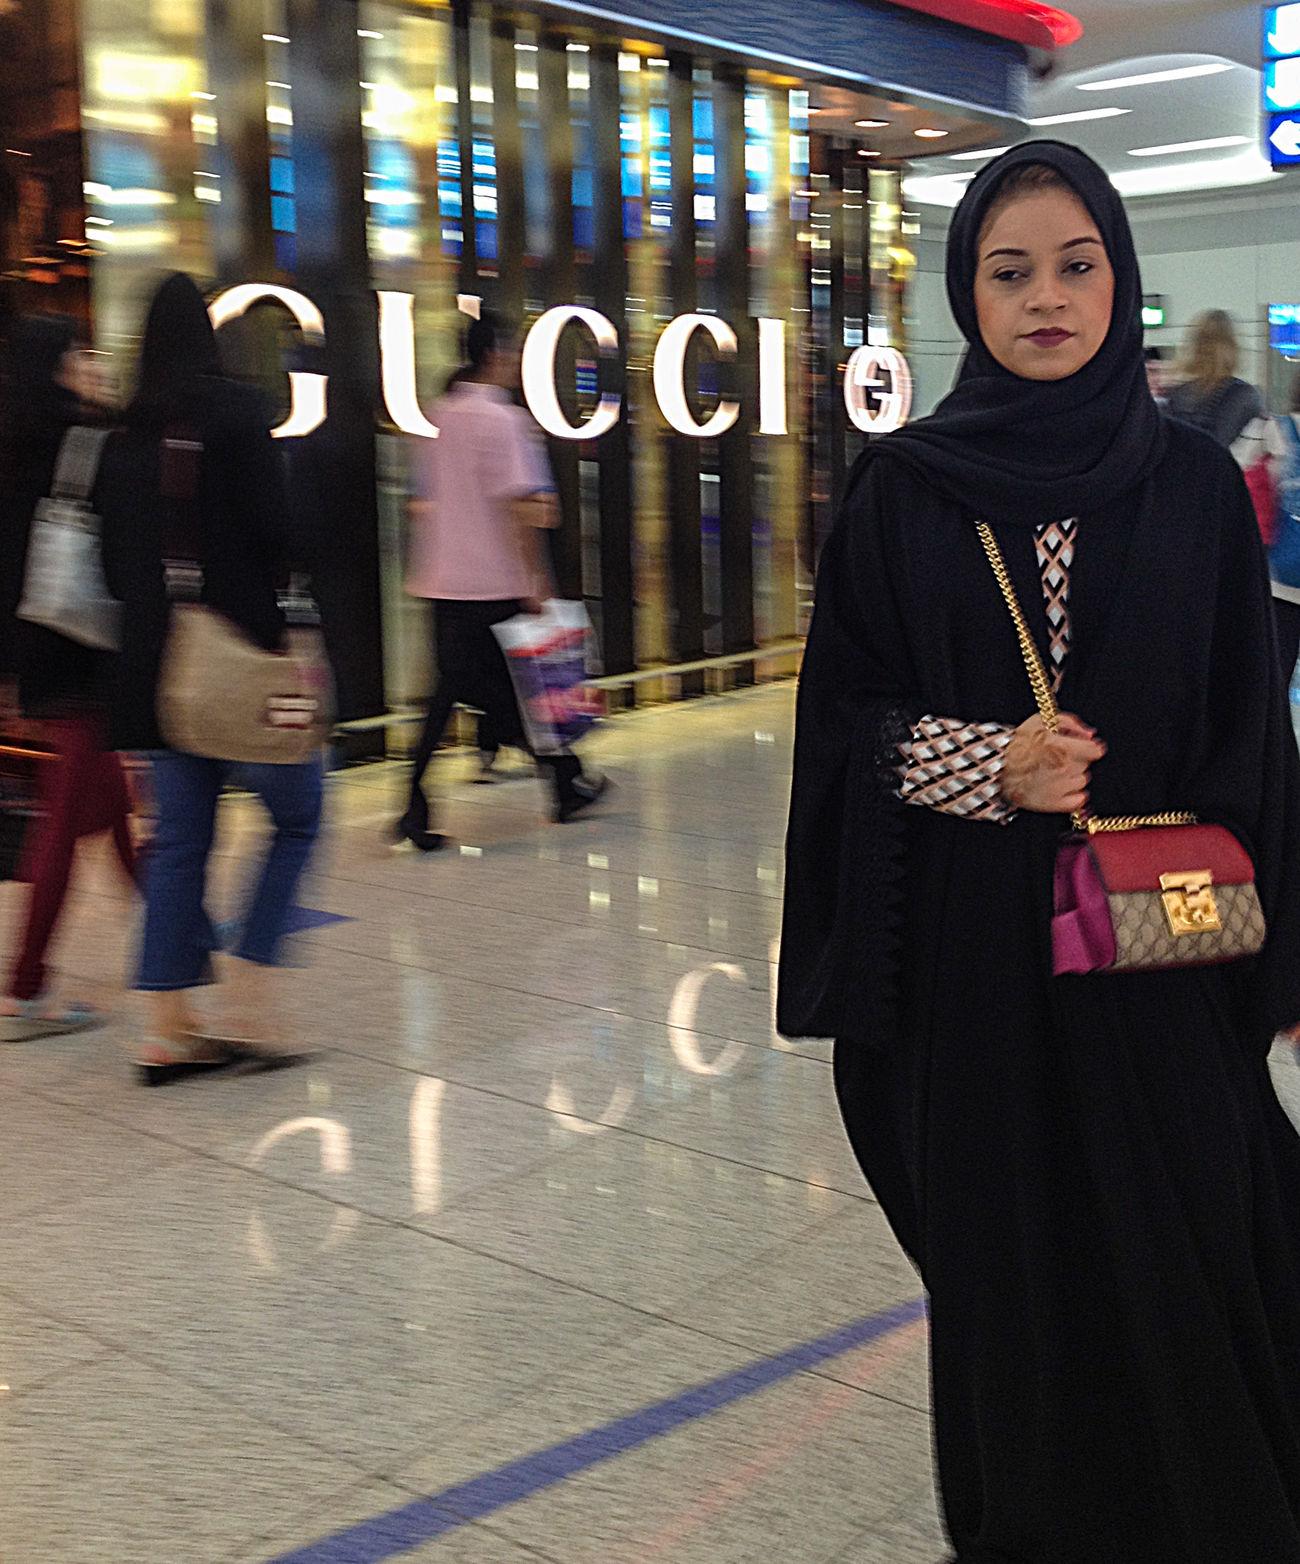 Gucci in Dubai Fashion GUCCI Modest My Year My View Streetfashion Streetphotography Woman